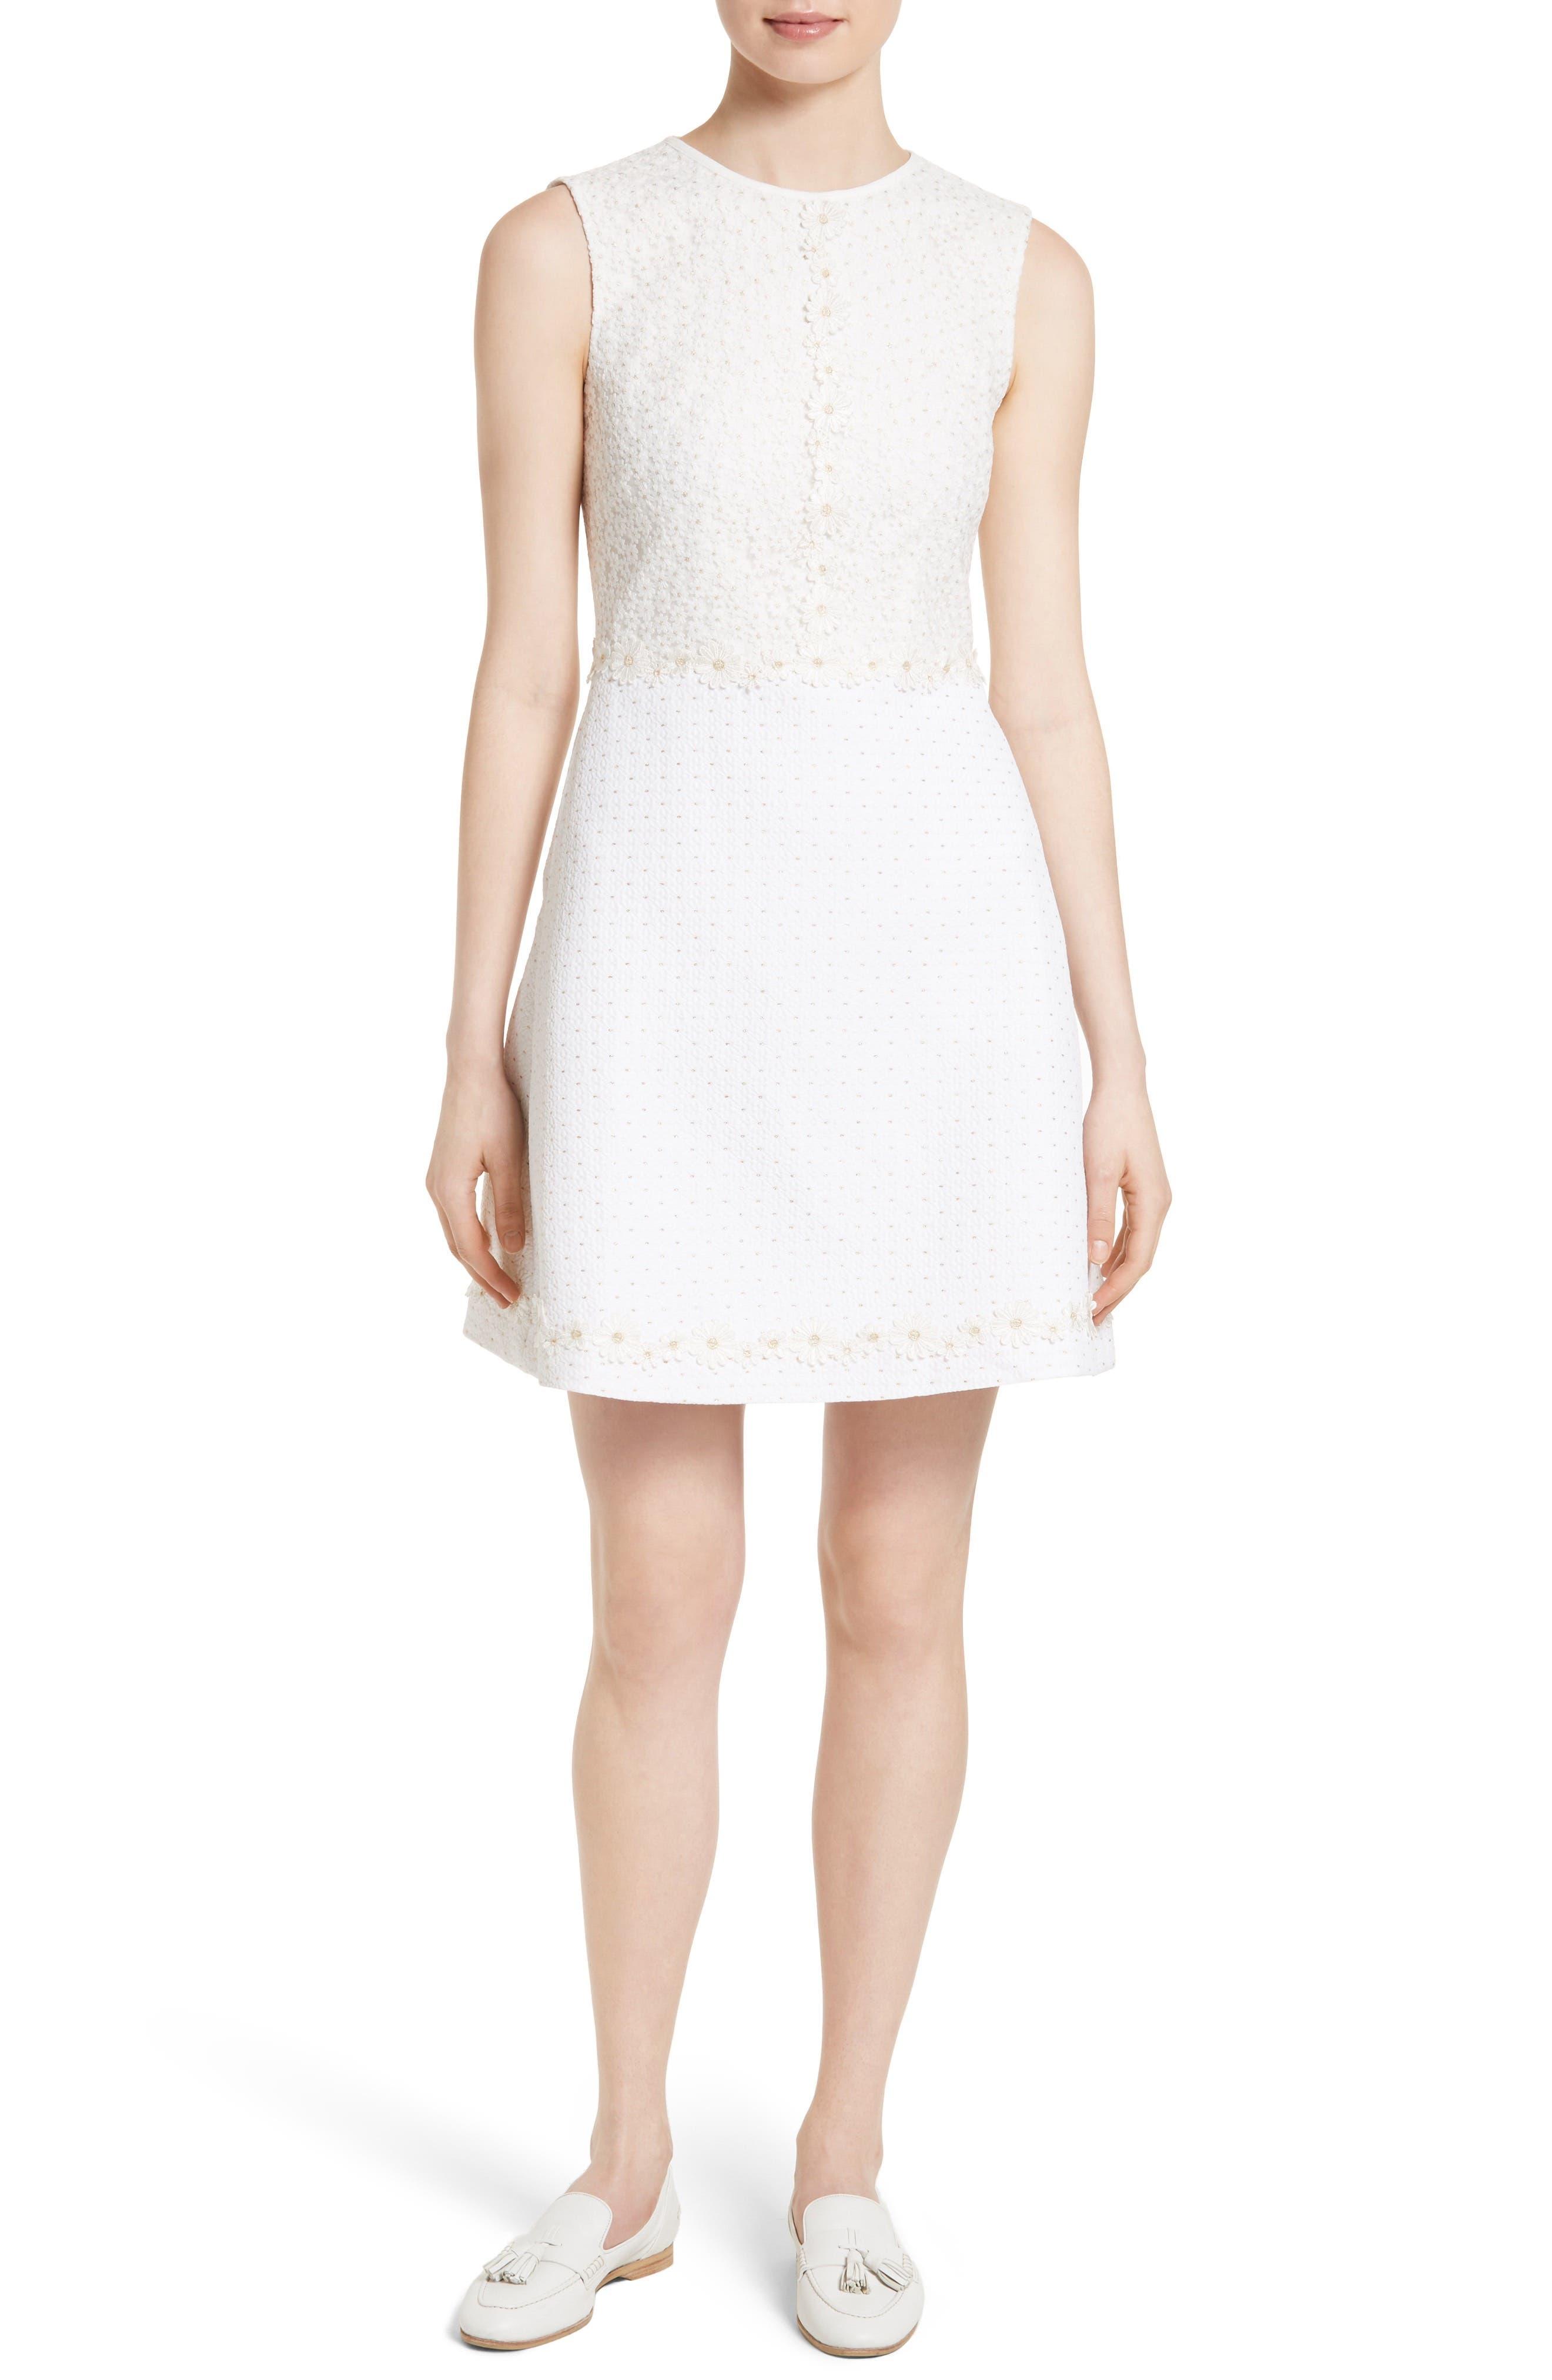 Alternate Image 1 Selected - Ted Baker London Olara Daisy Lace Shift Dress